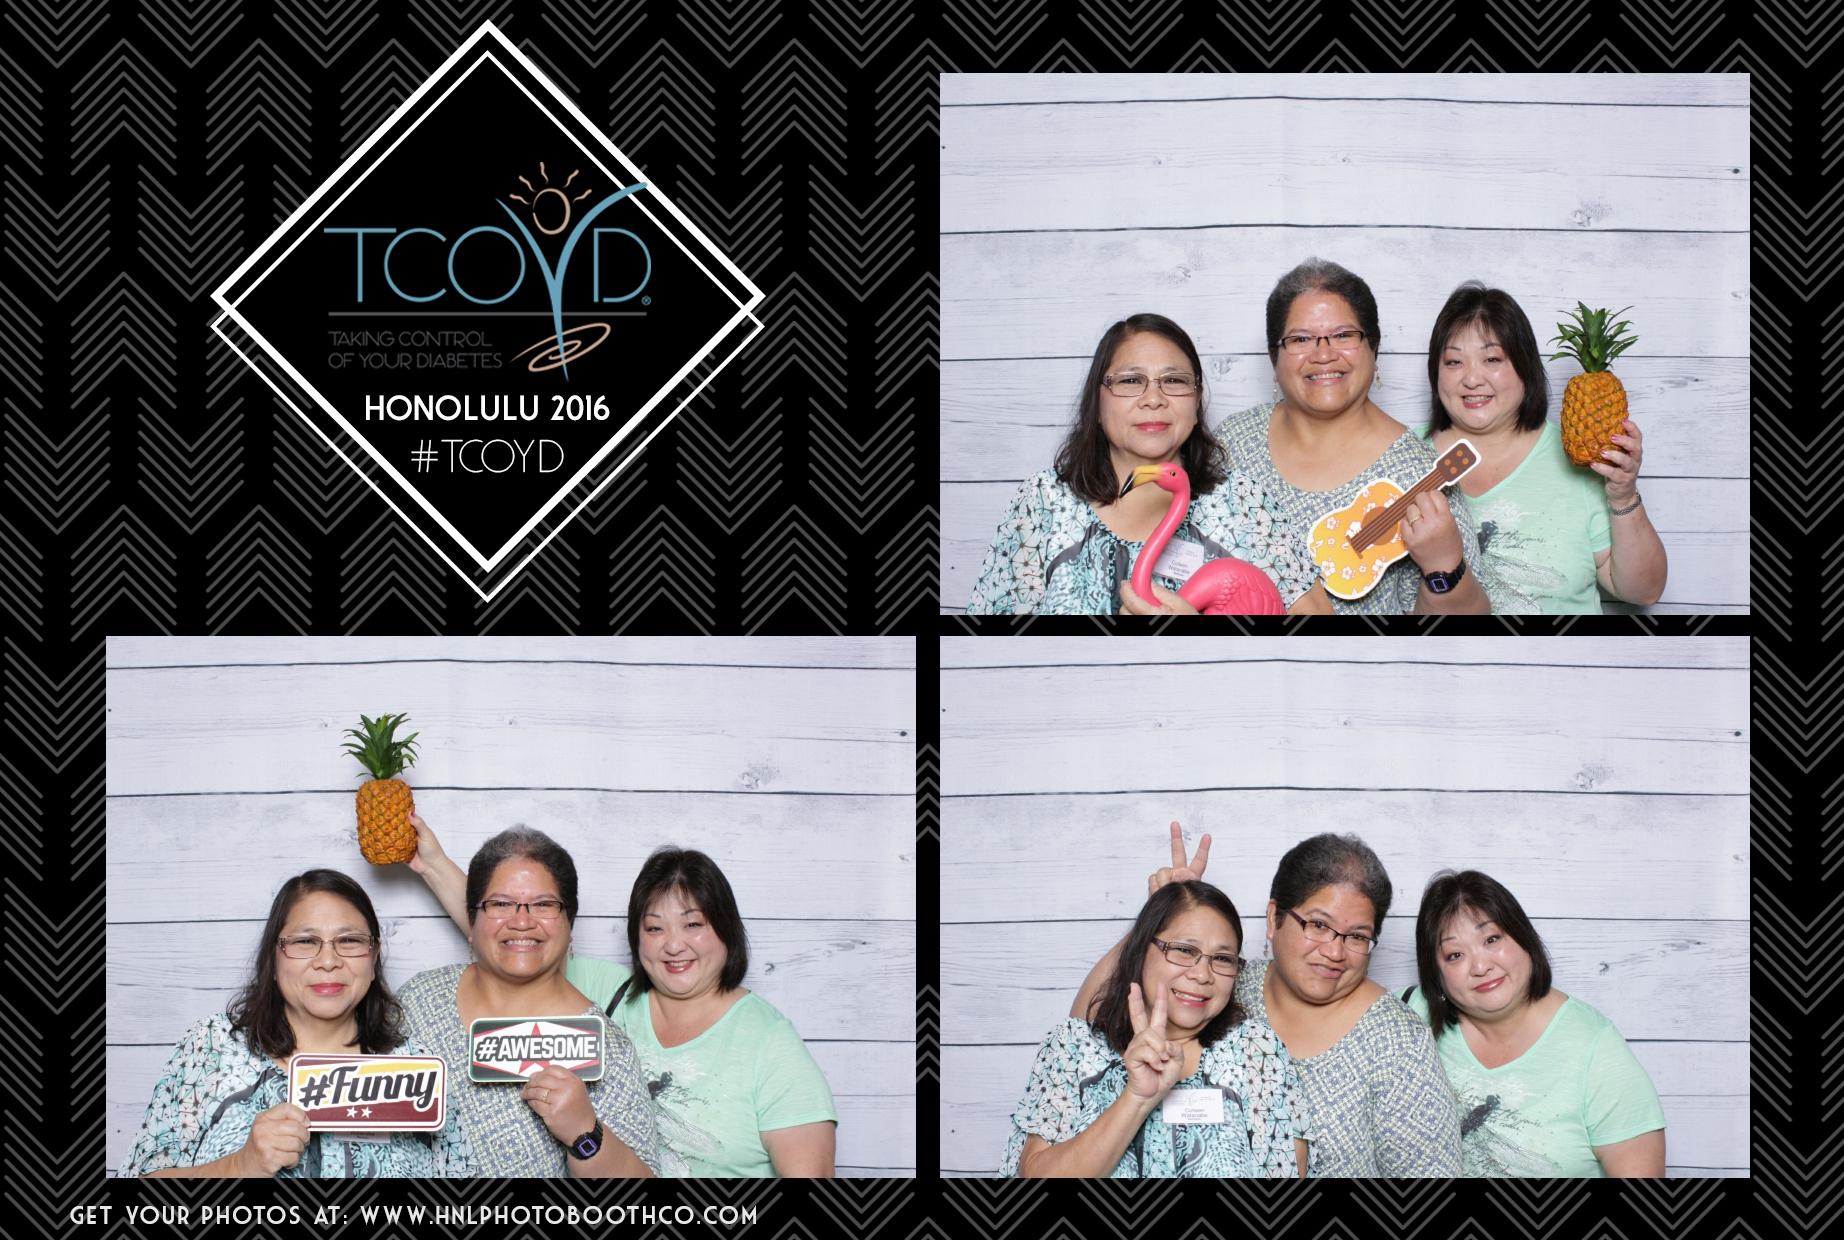 Hawaii honolulu aiea kapolei ewa kaneohe kailua photo booth rentals photography party event corporate wedding graduation birthday kakaako waikikii